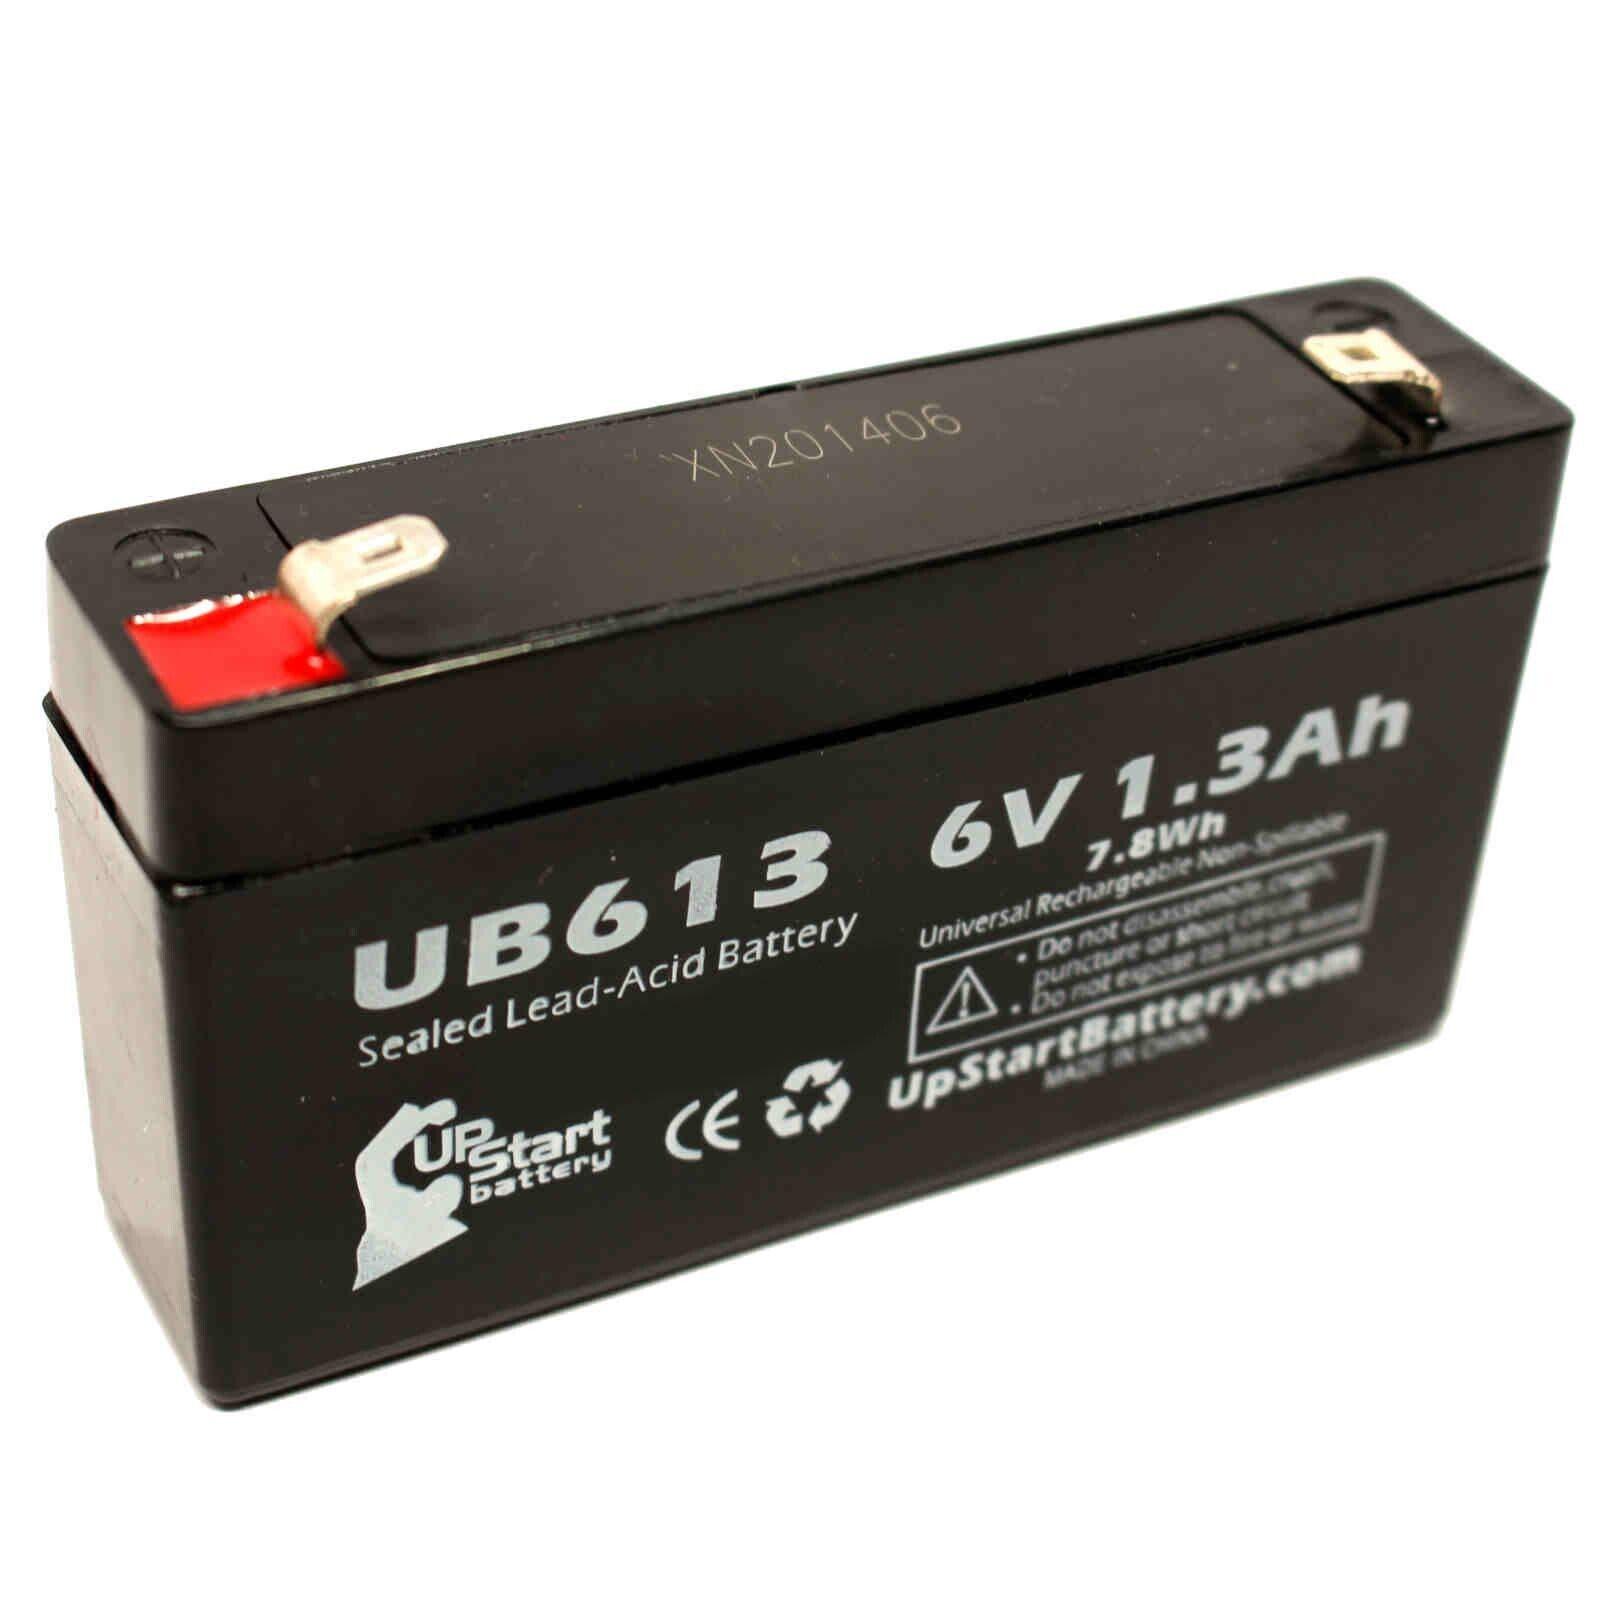 6V 1.3Ah Sealed Lead Acid Battery For LEOCH DJW6-1.2 UB613